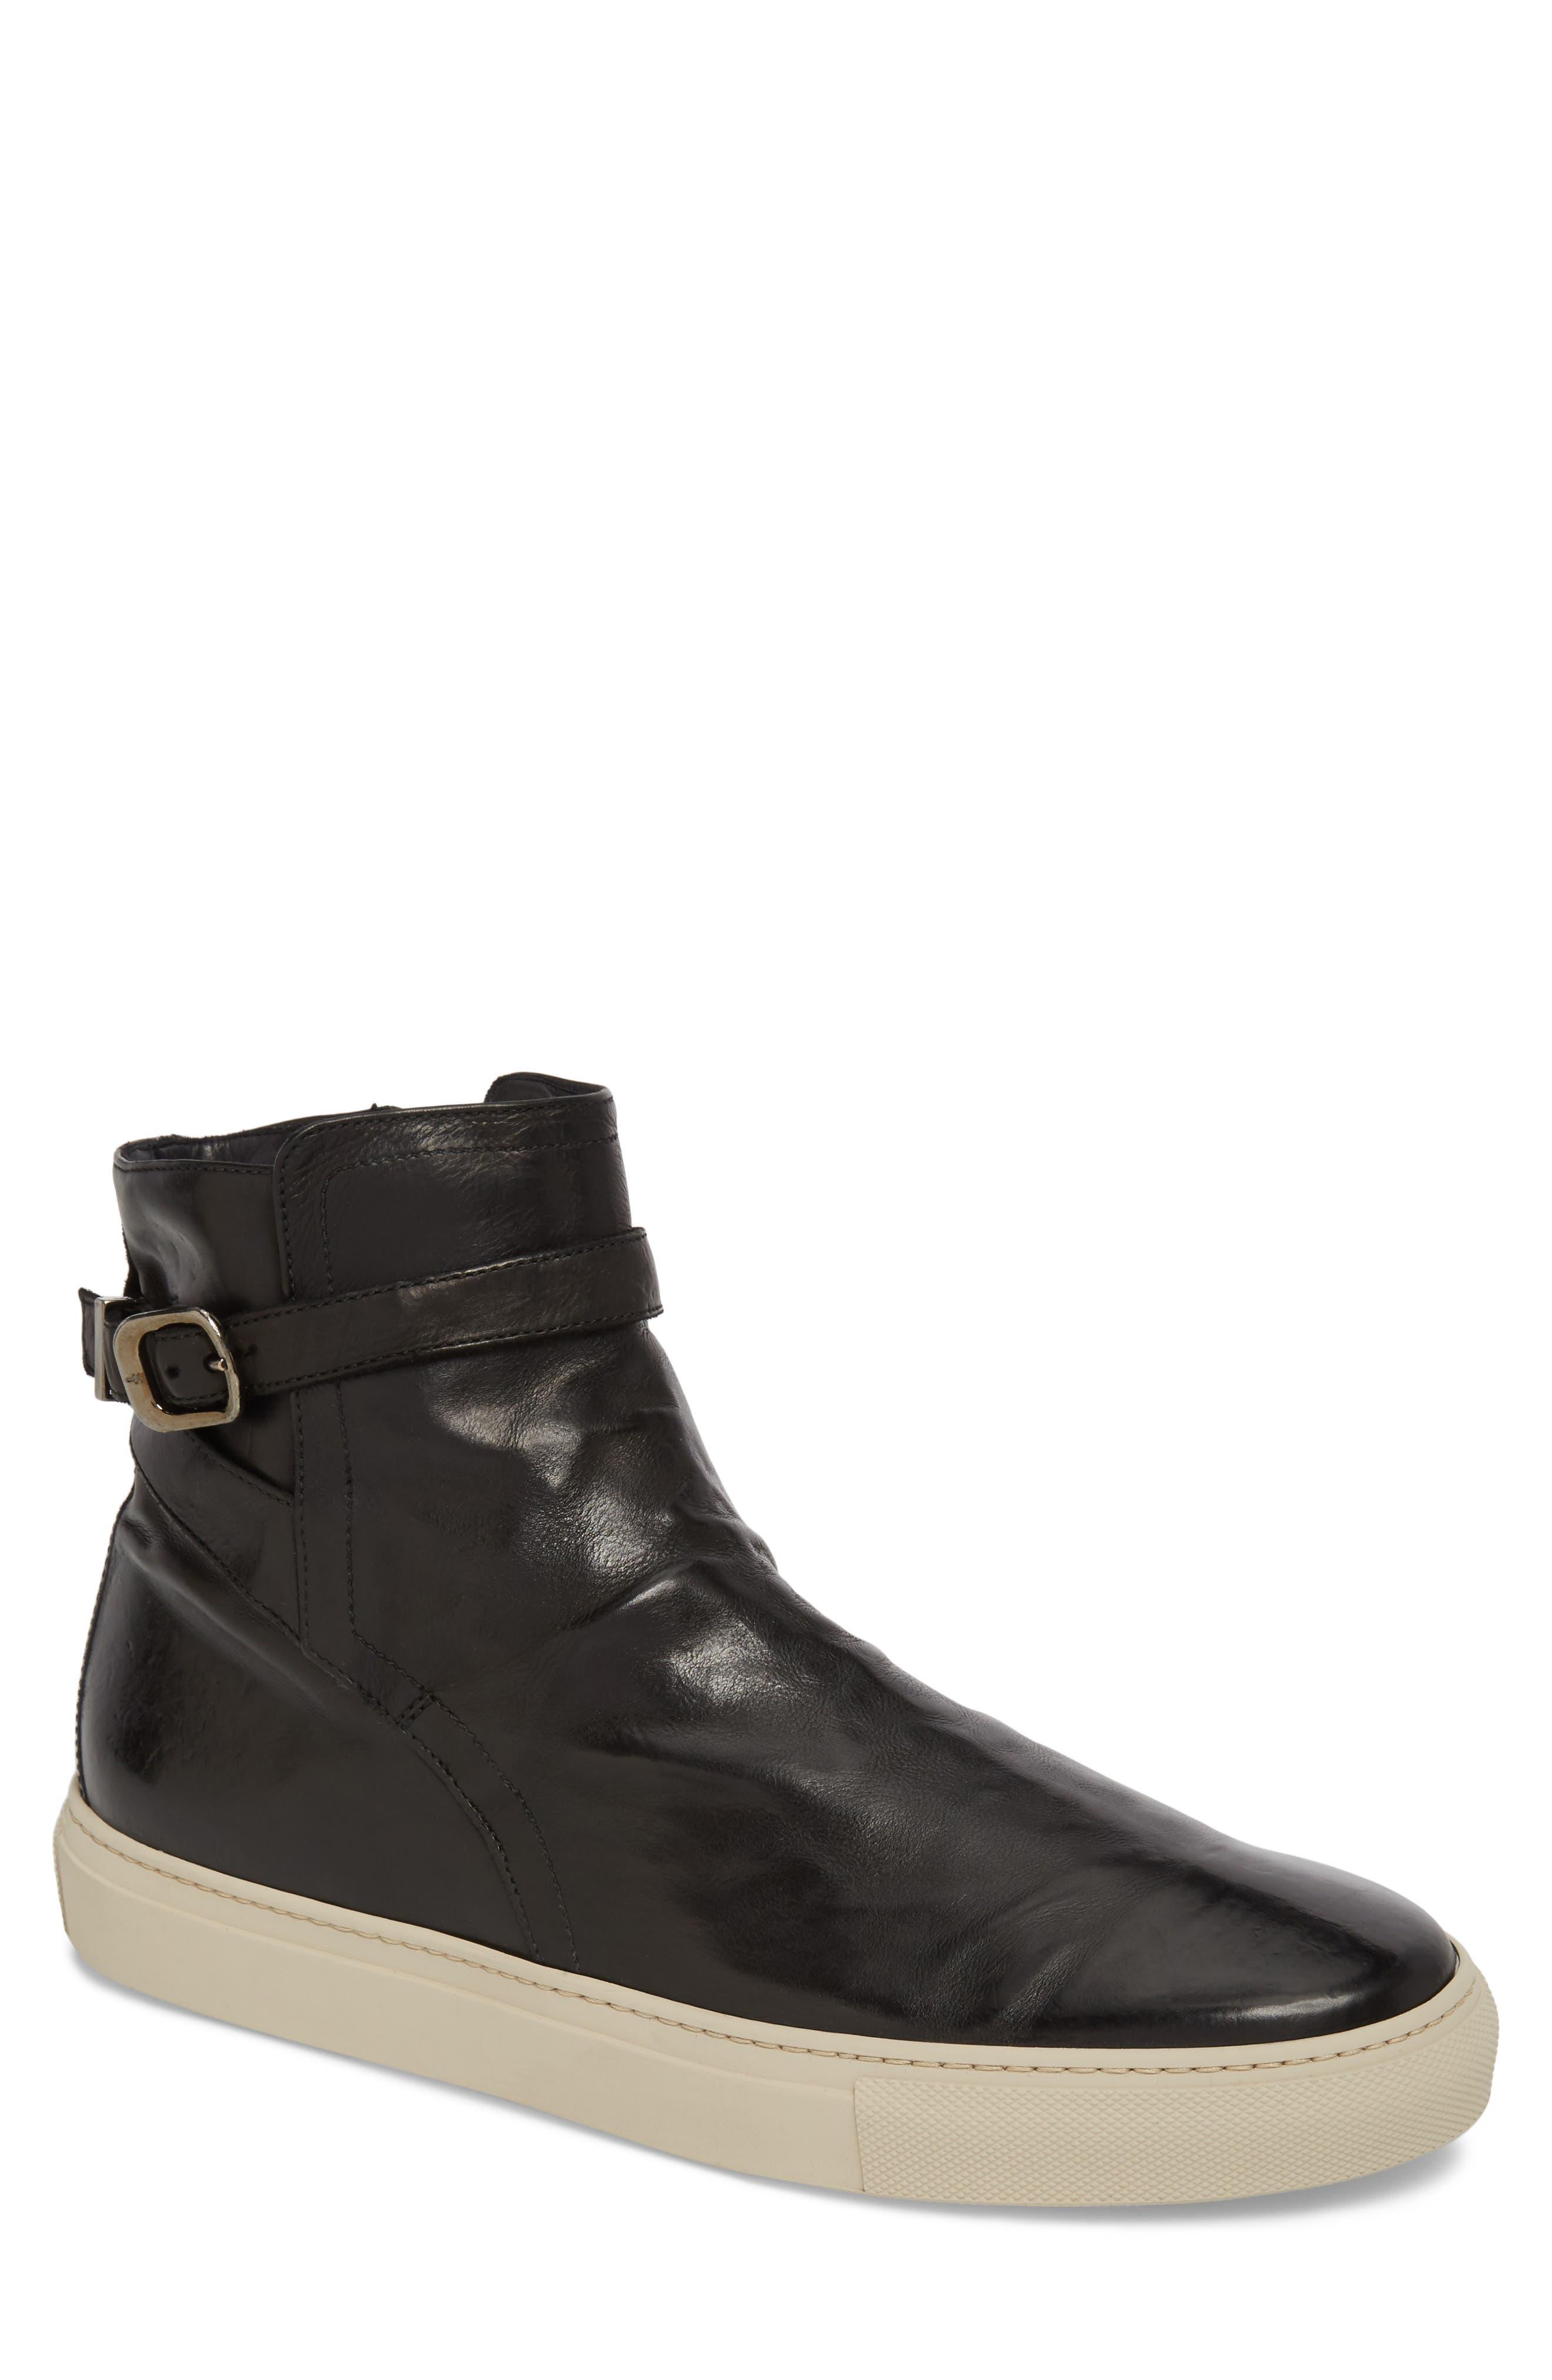 Owen Jodhpur High Top Sneaker,                         Main,                         color,